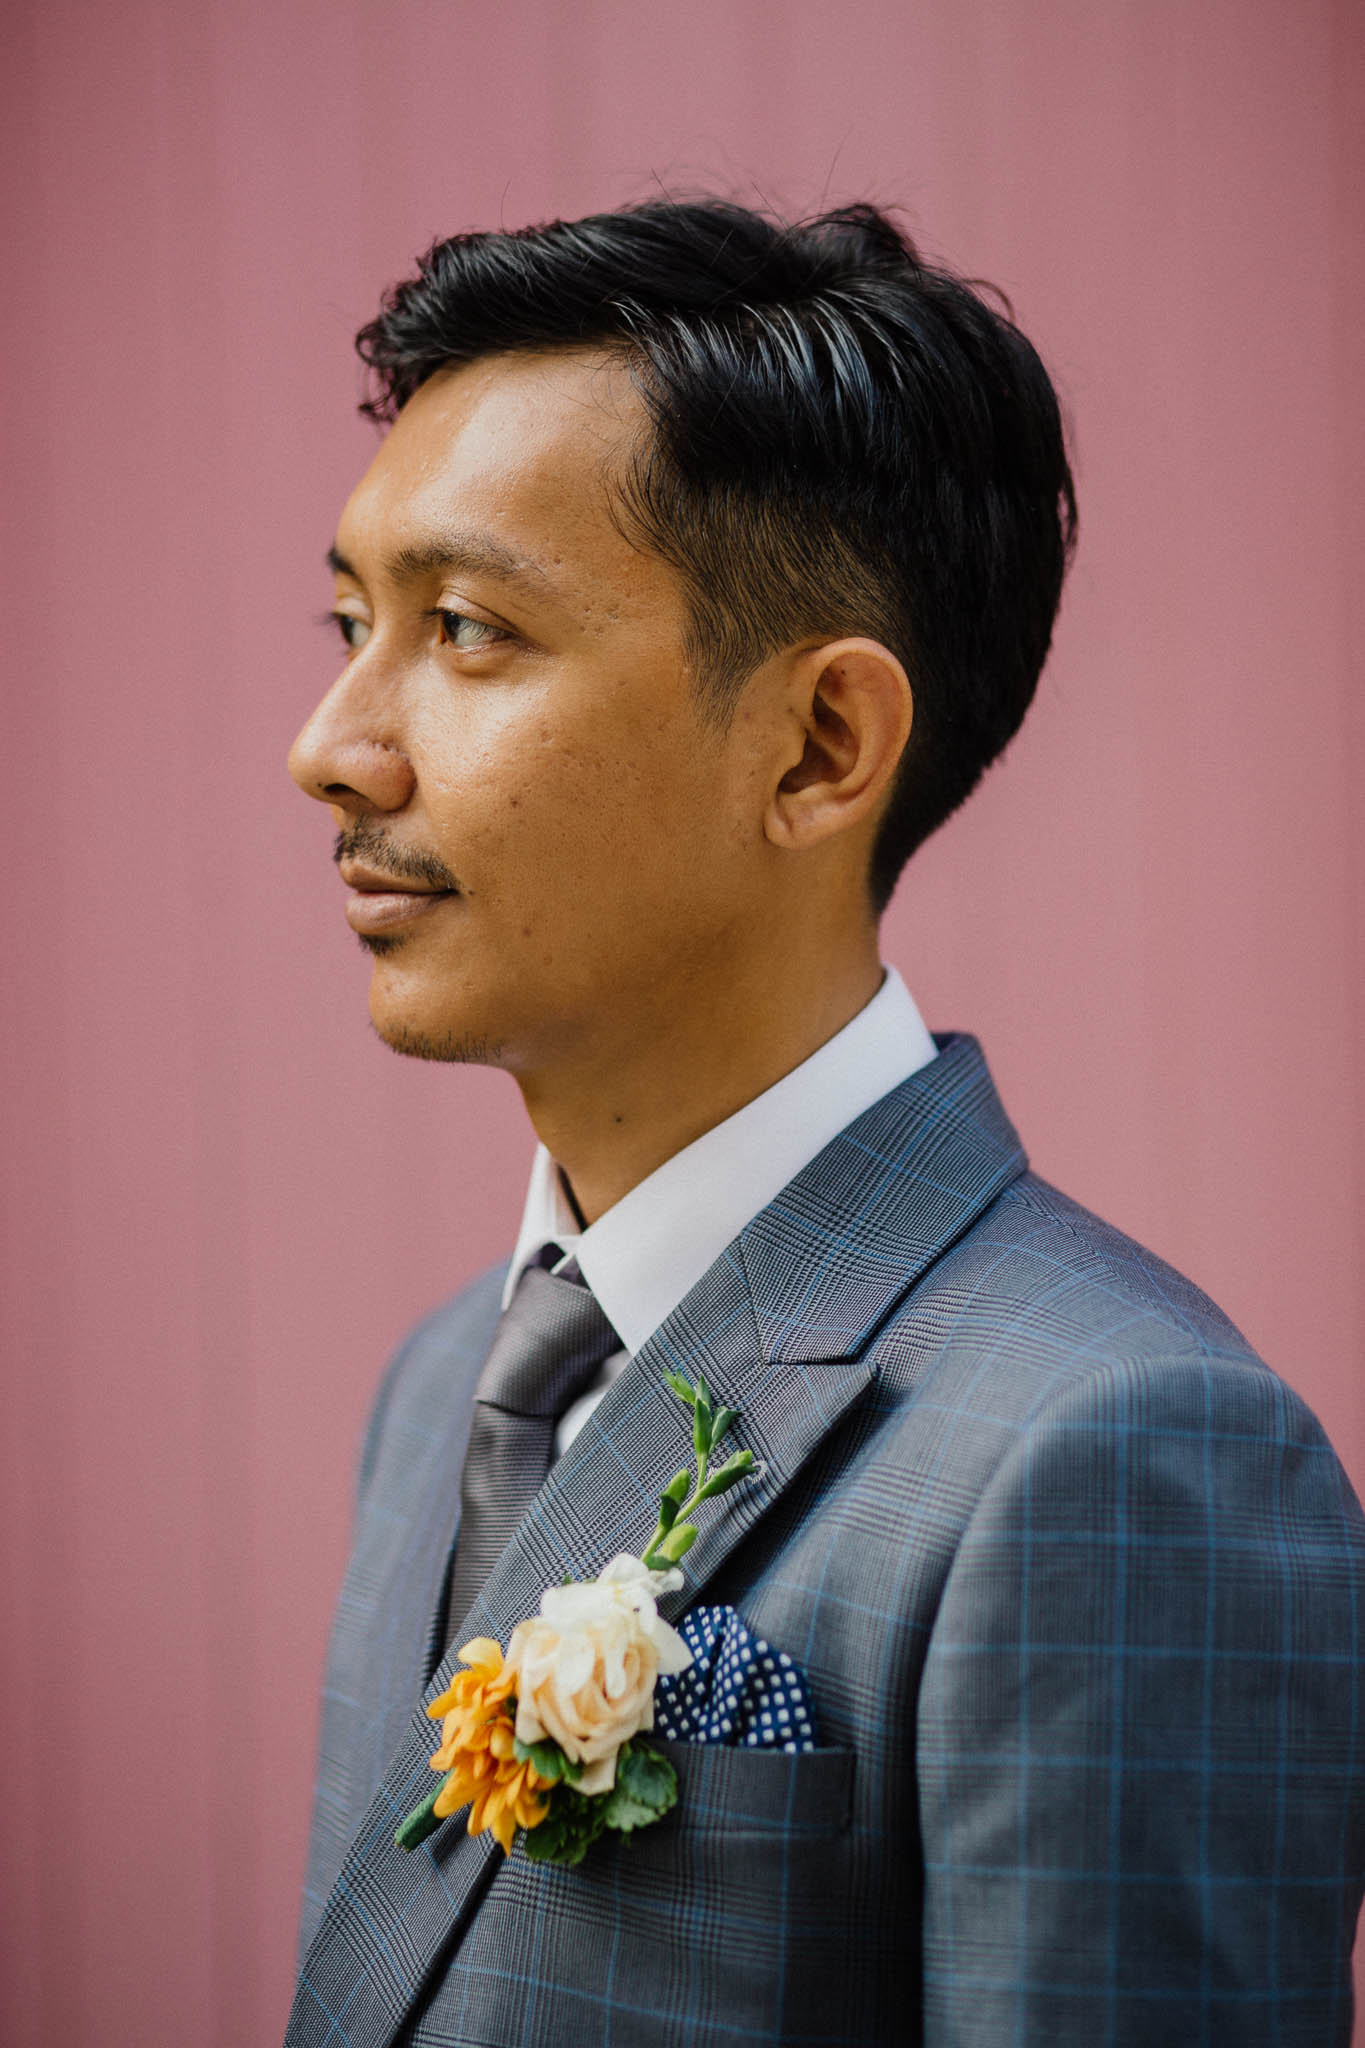 singapore-wedding-photographer-addafiq-nufail-083.jpg